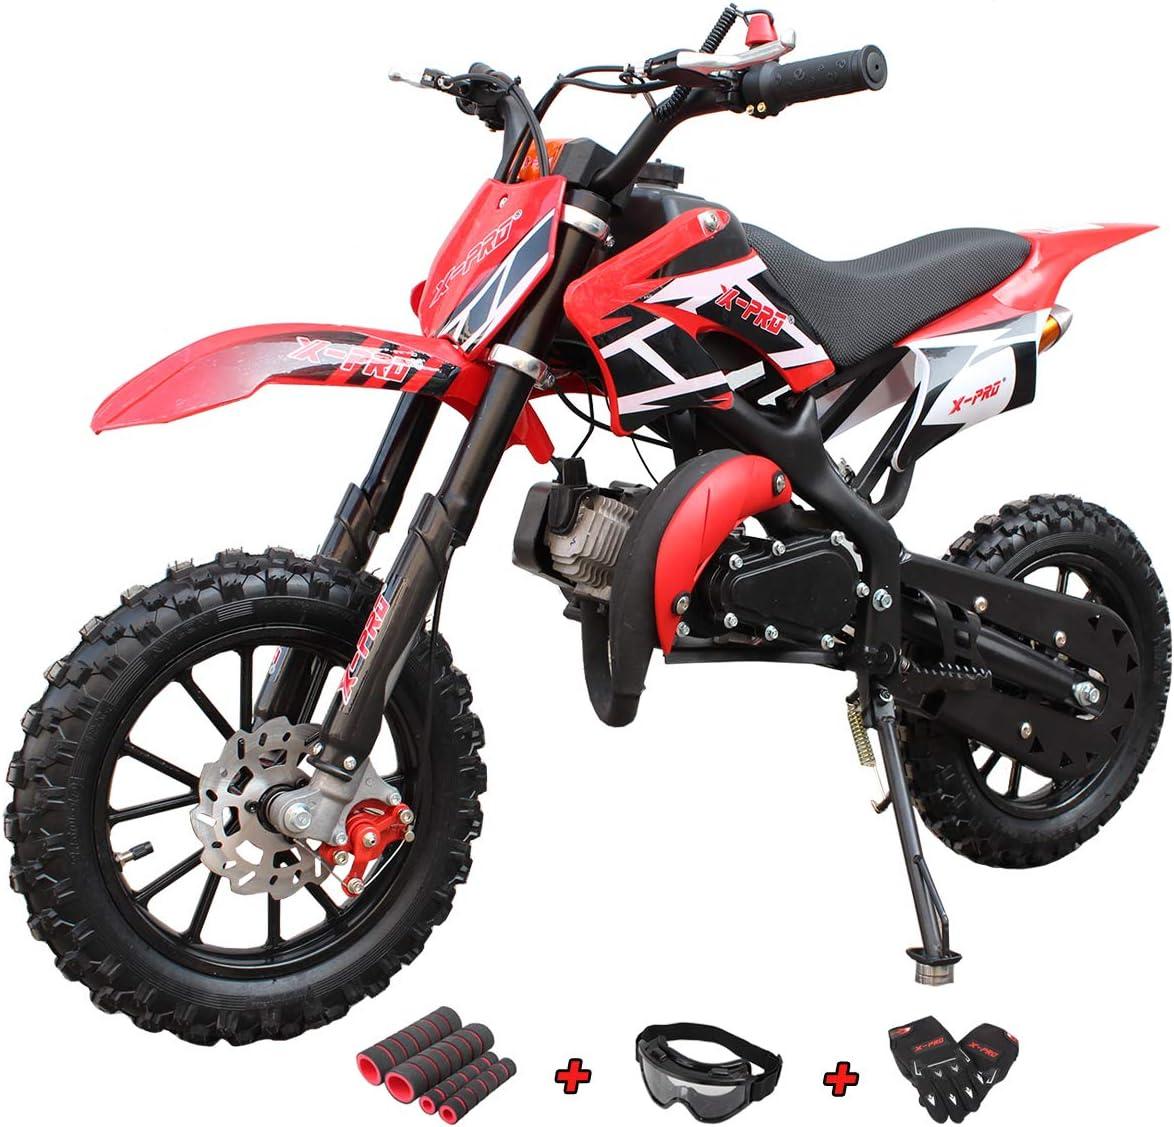 X-Pro 50cc Dirt Bike Gas For Kids